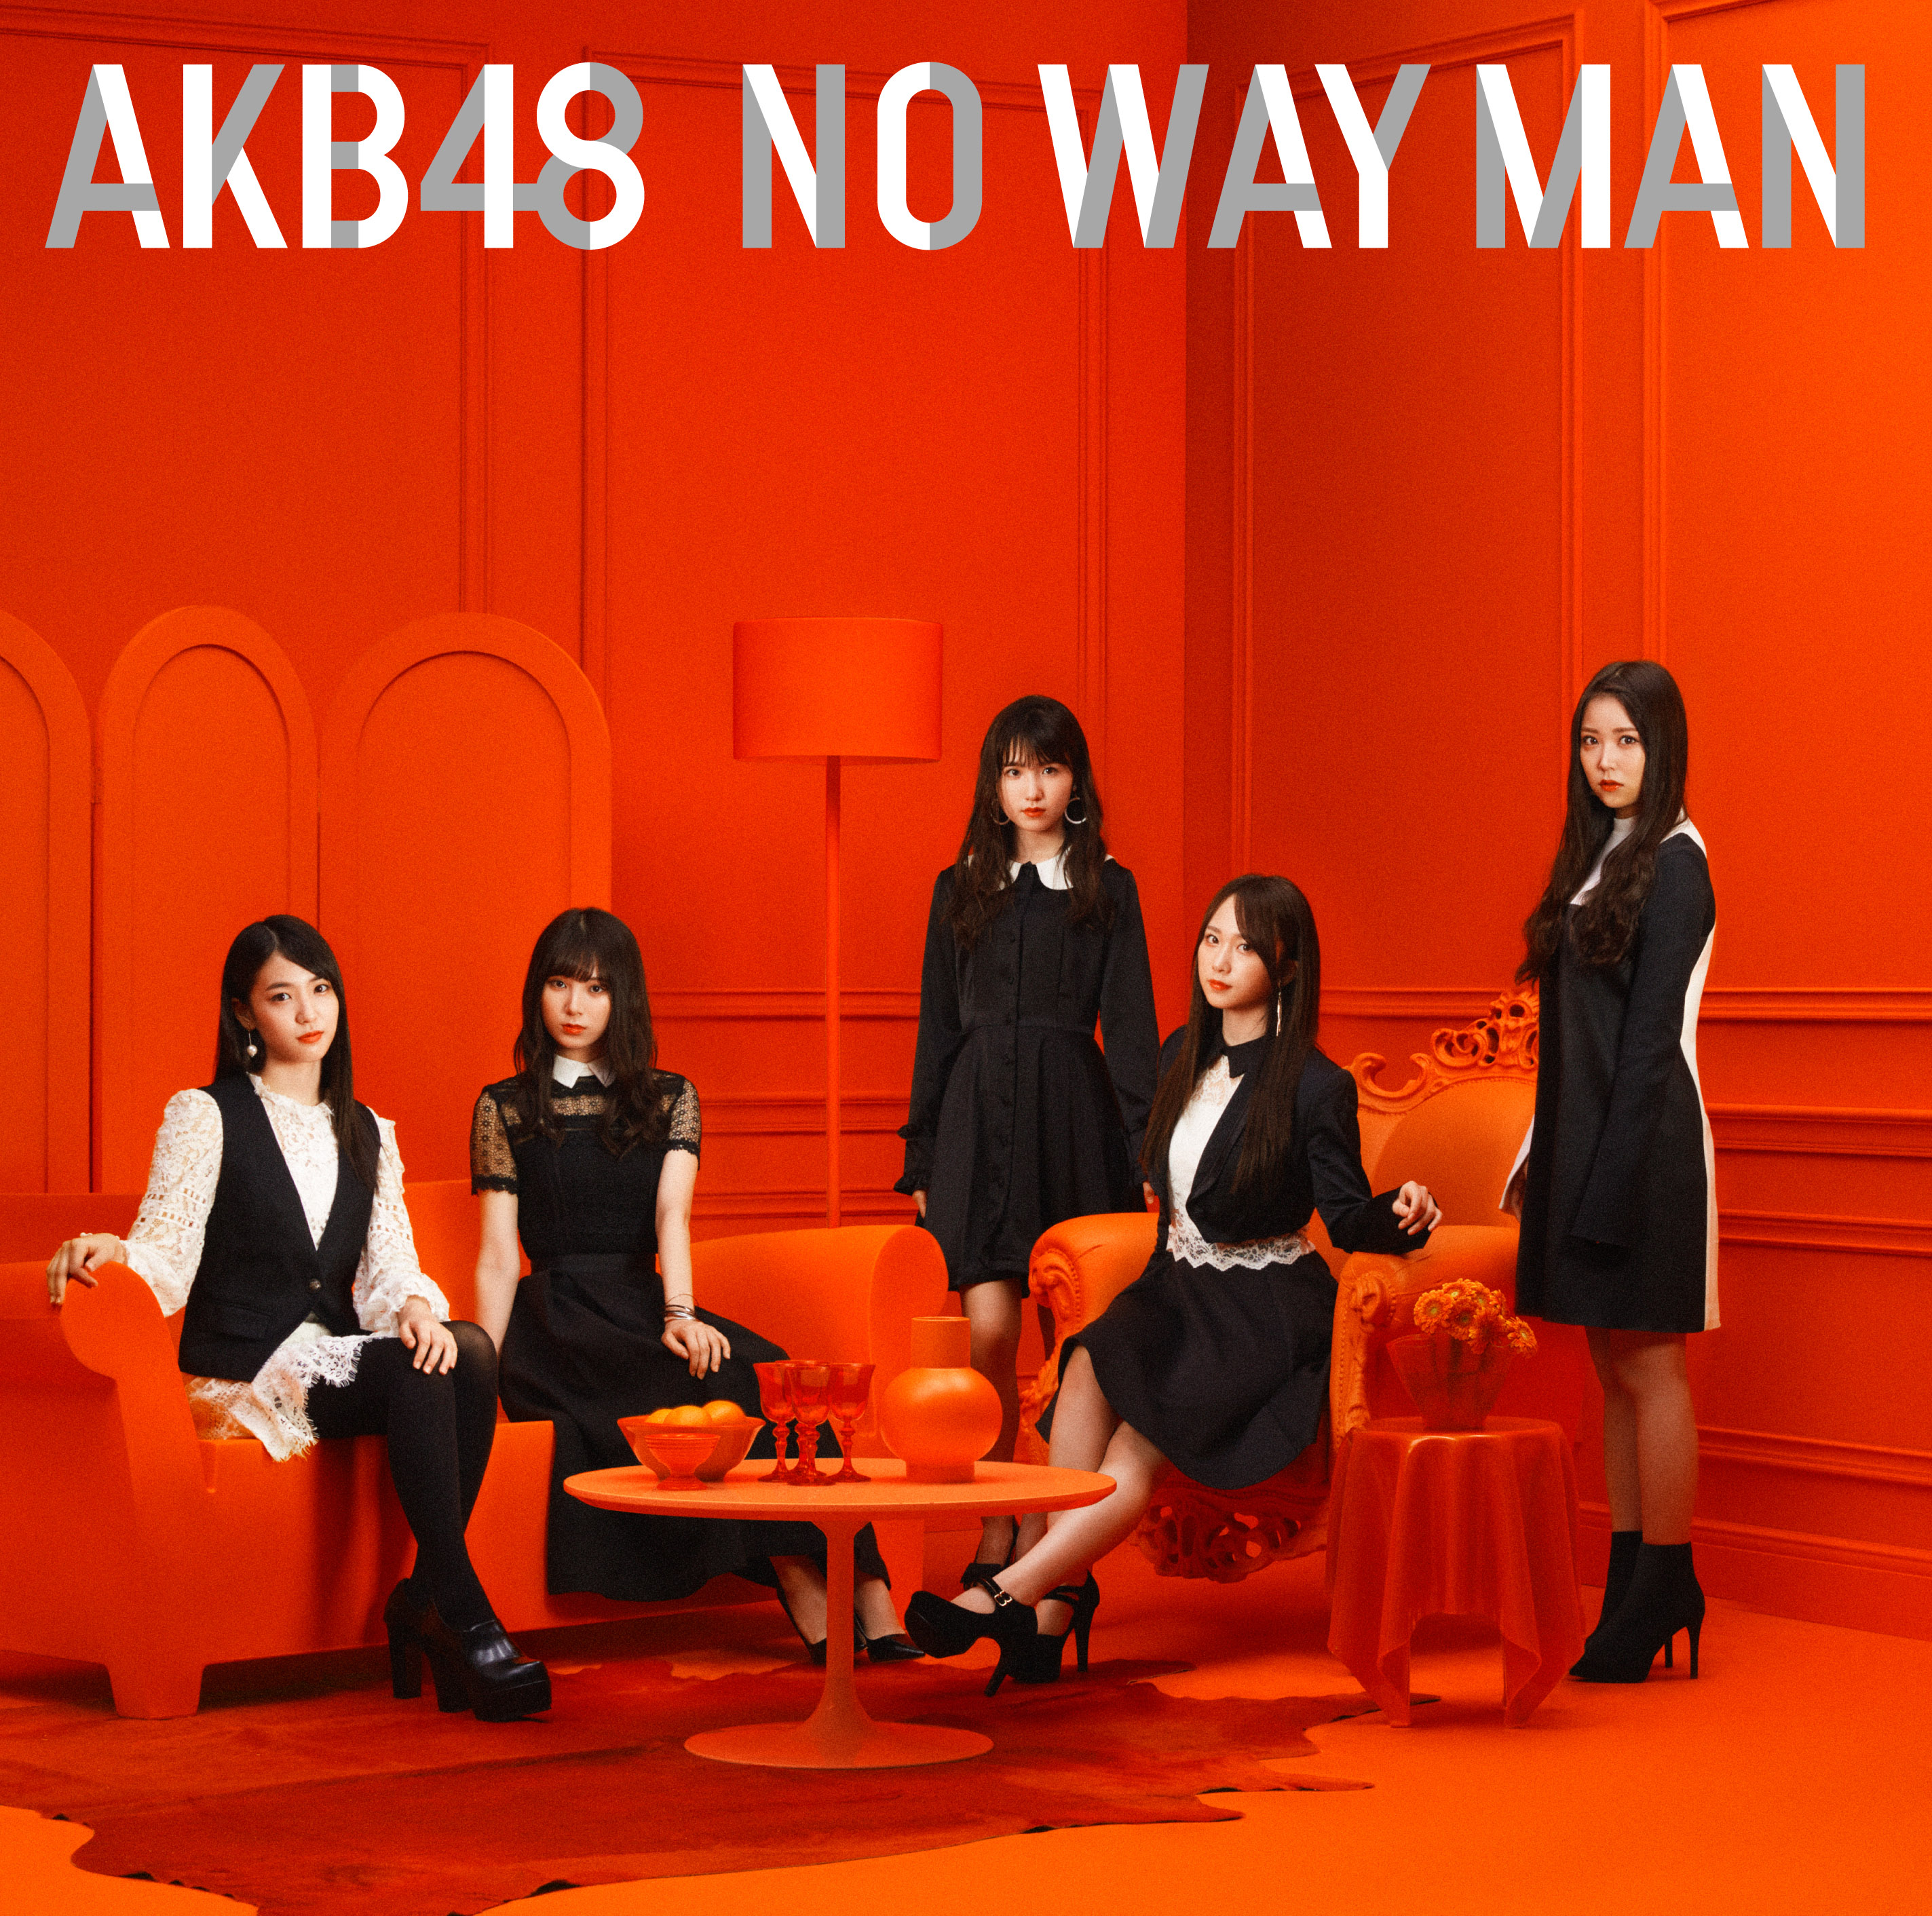 NO WAY MAN